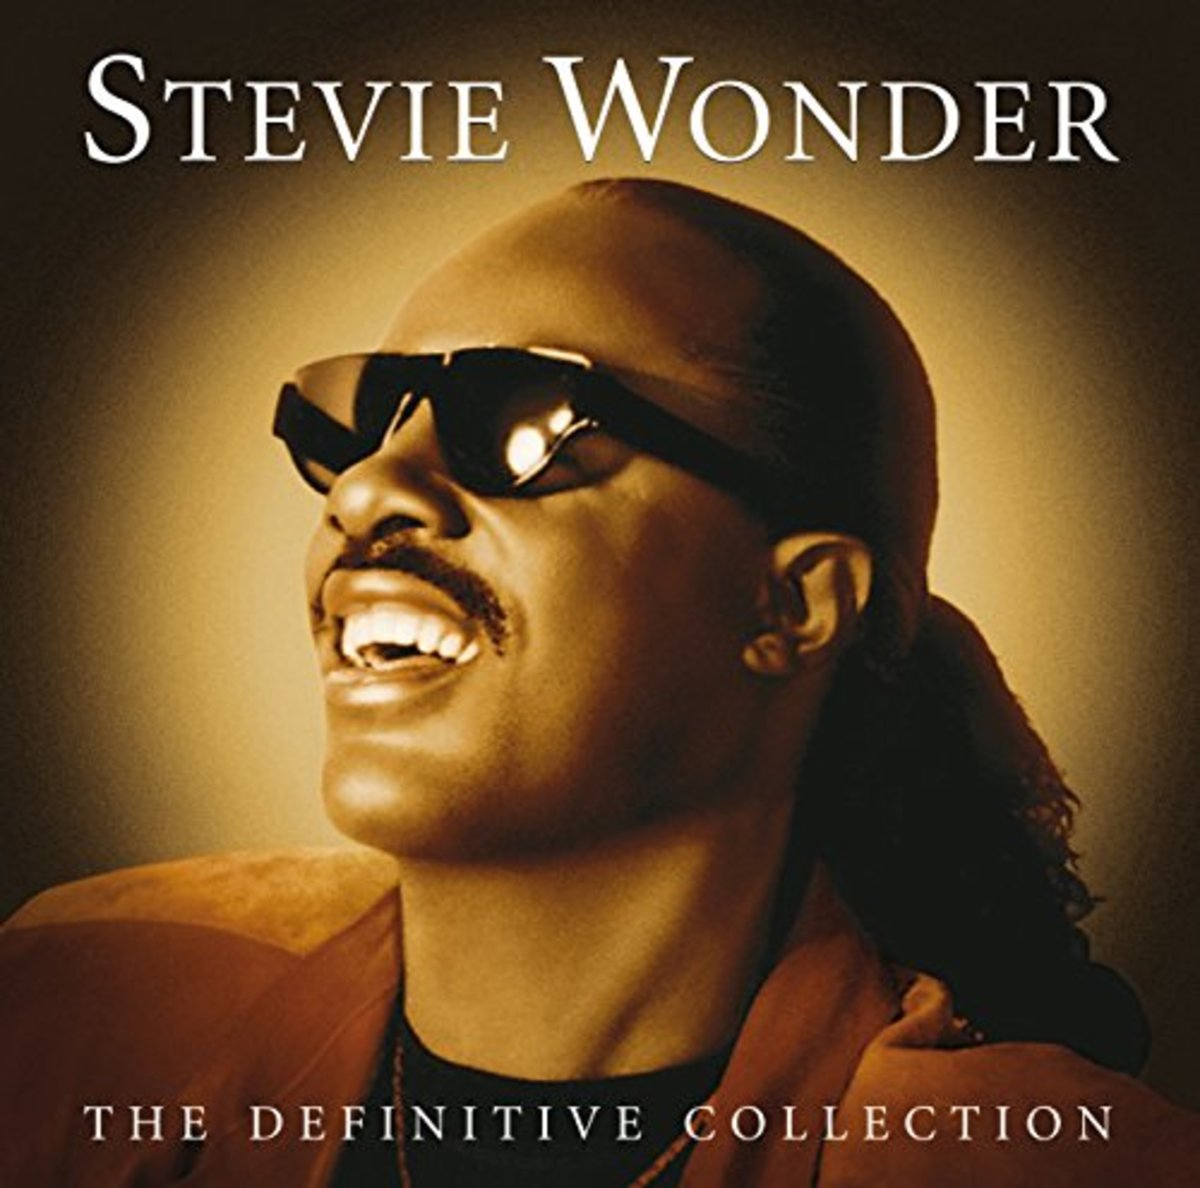 a-stevie-wonder